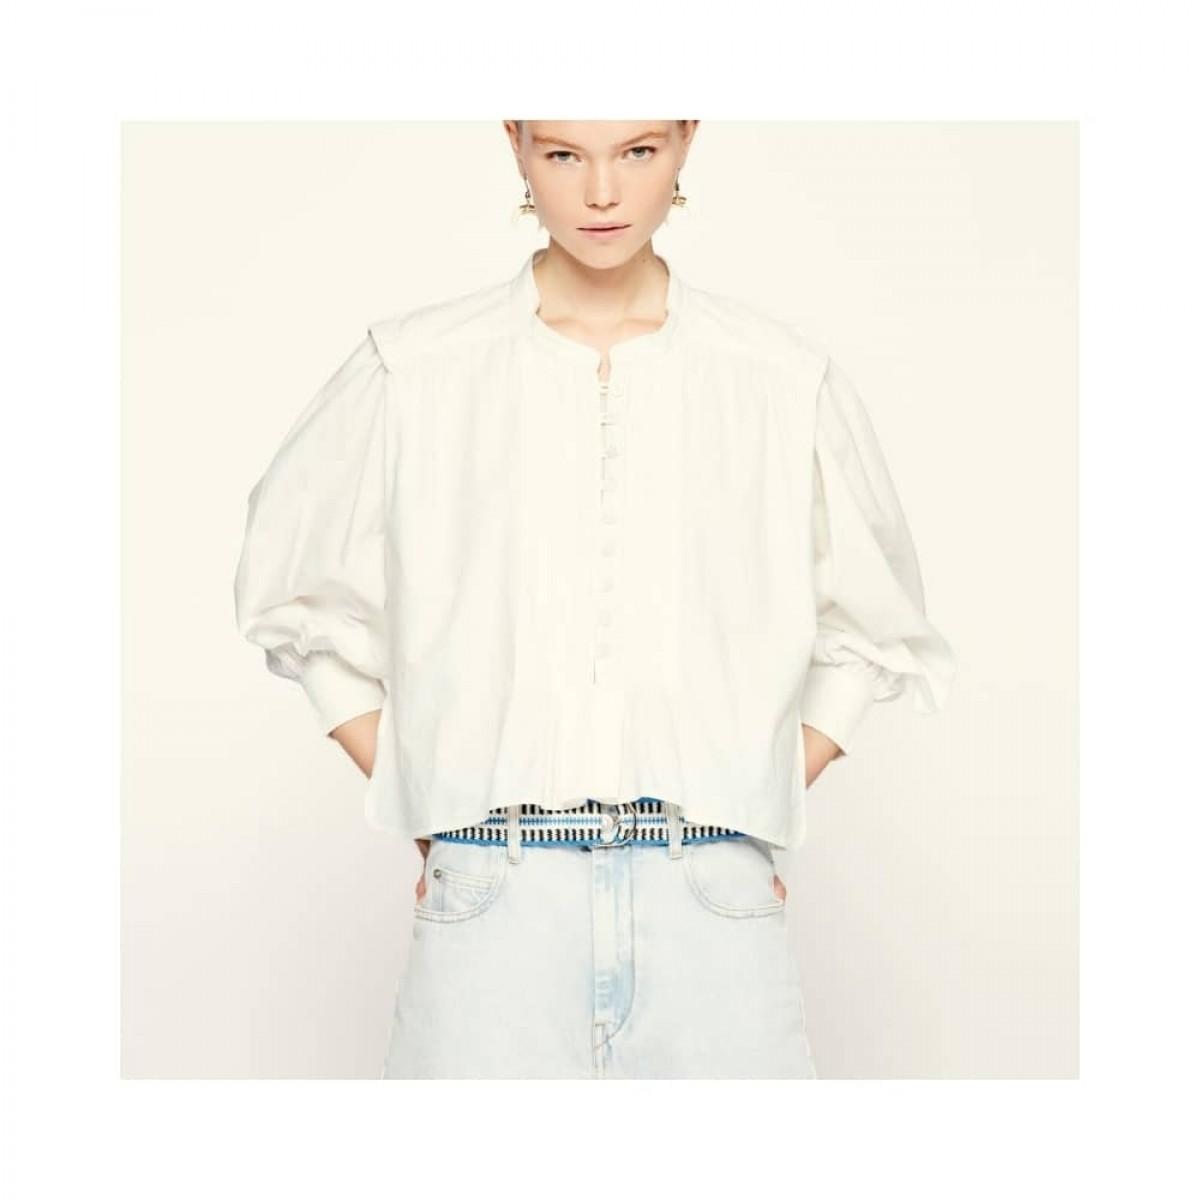 okina top - white - model front